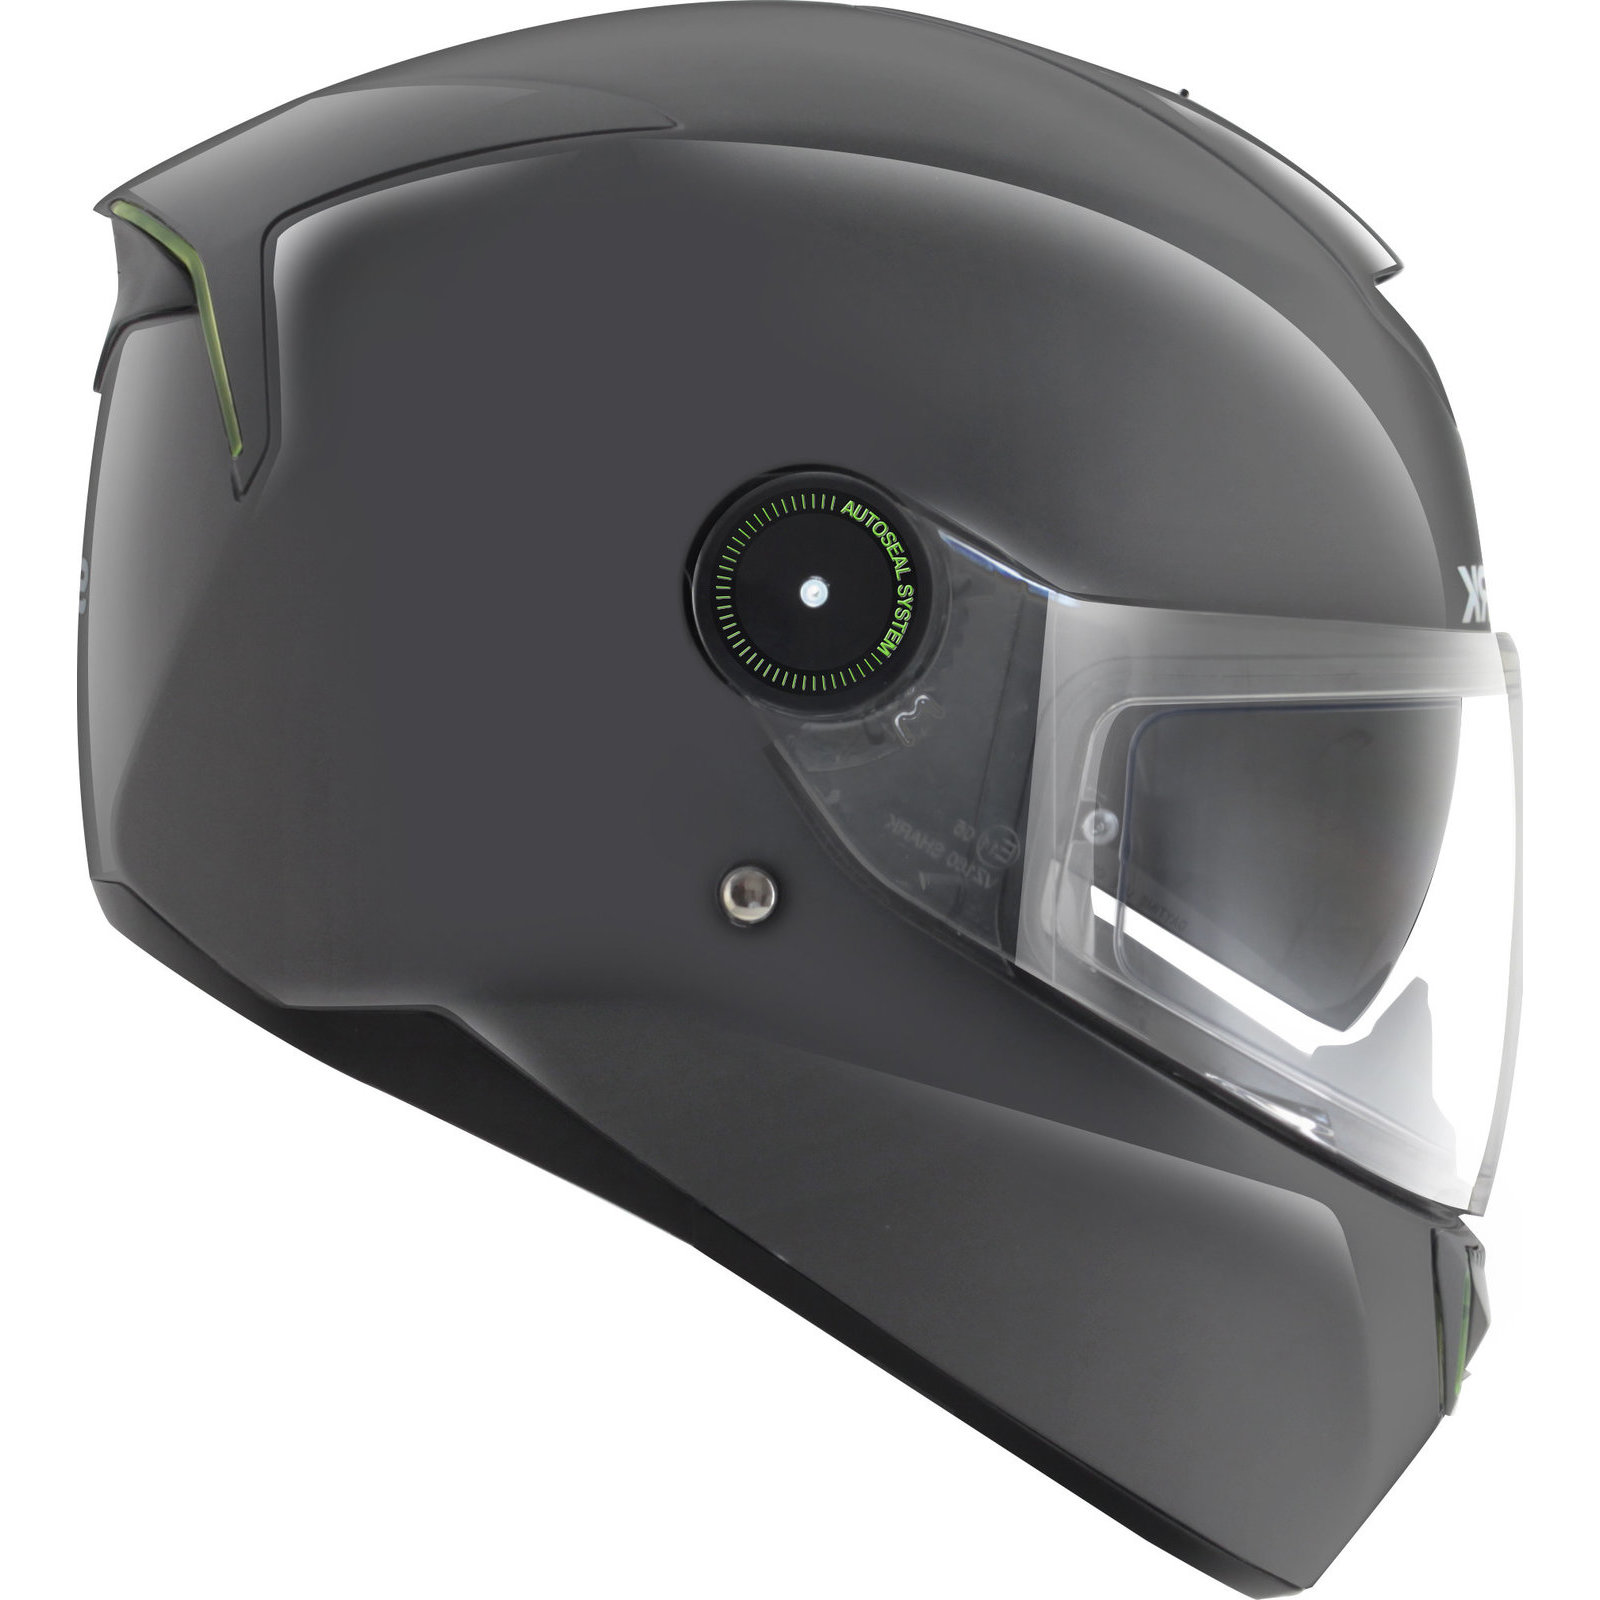 shark skwal blank led light full face sun visor motorbike motorcycle helmet. Black Bedroom Furniture Sets. Home Design Ideas